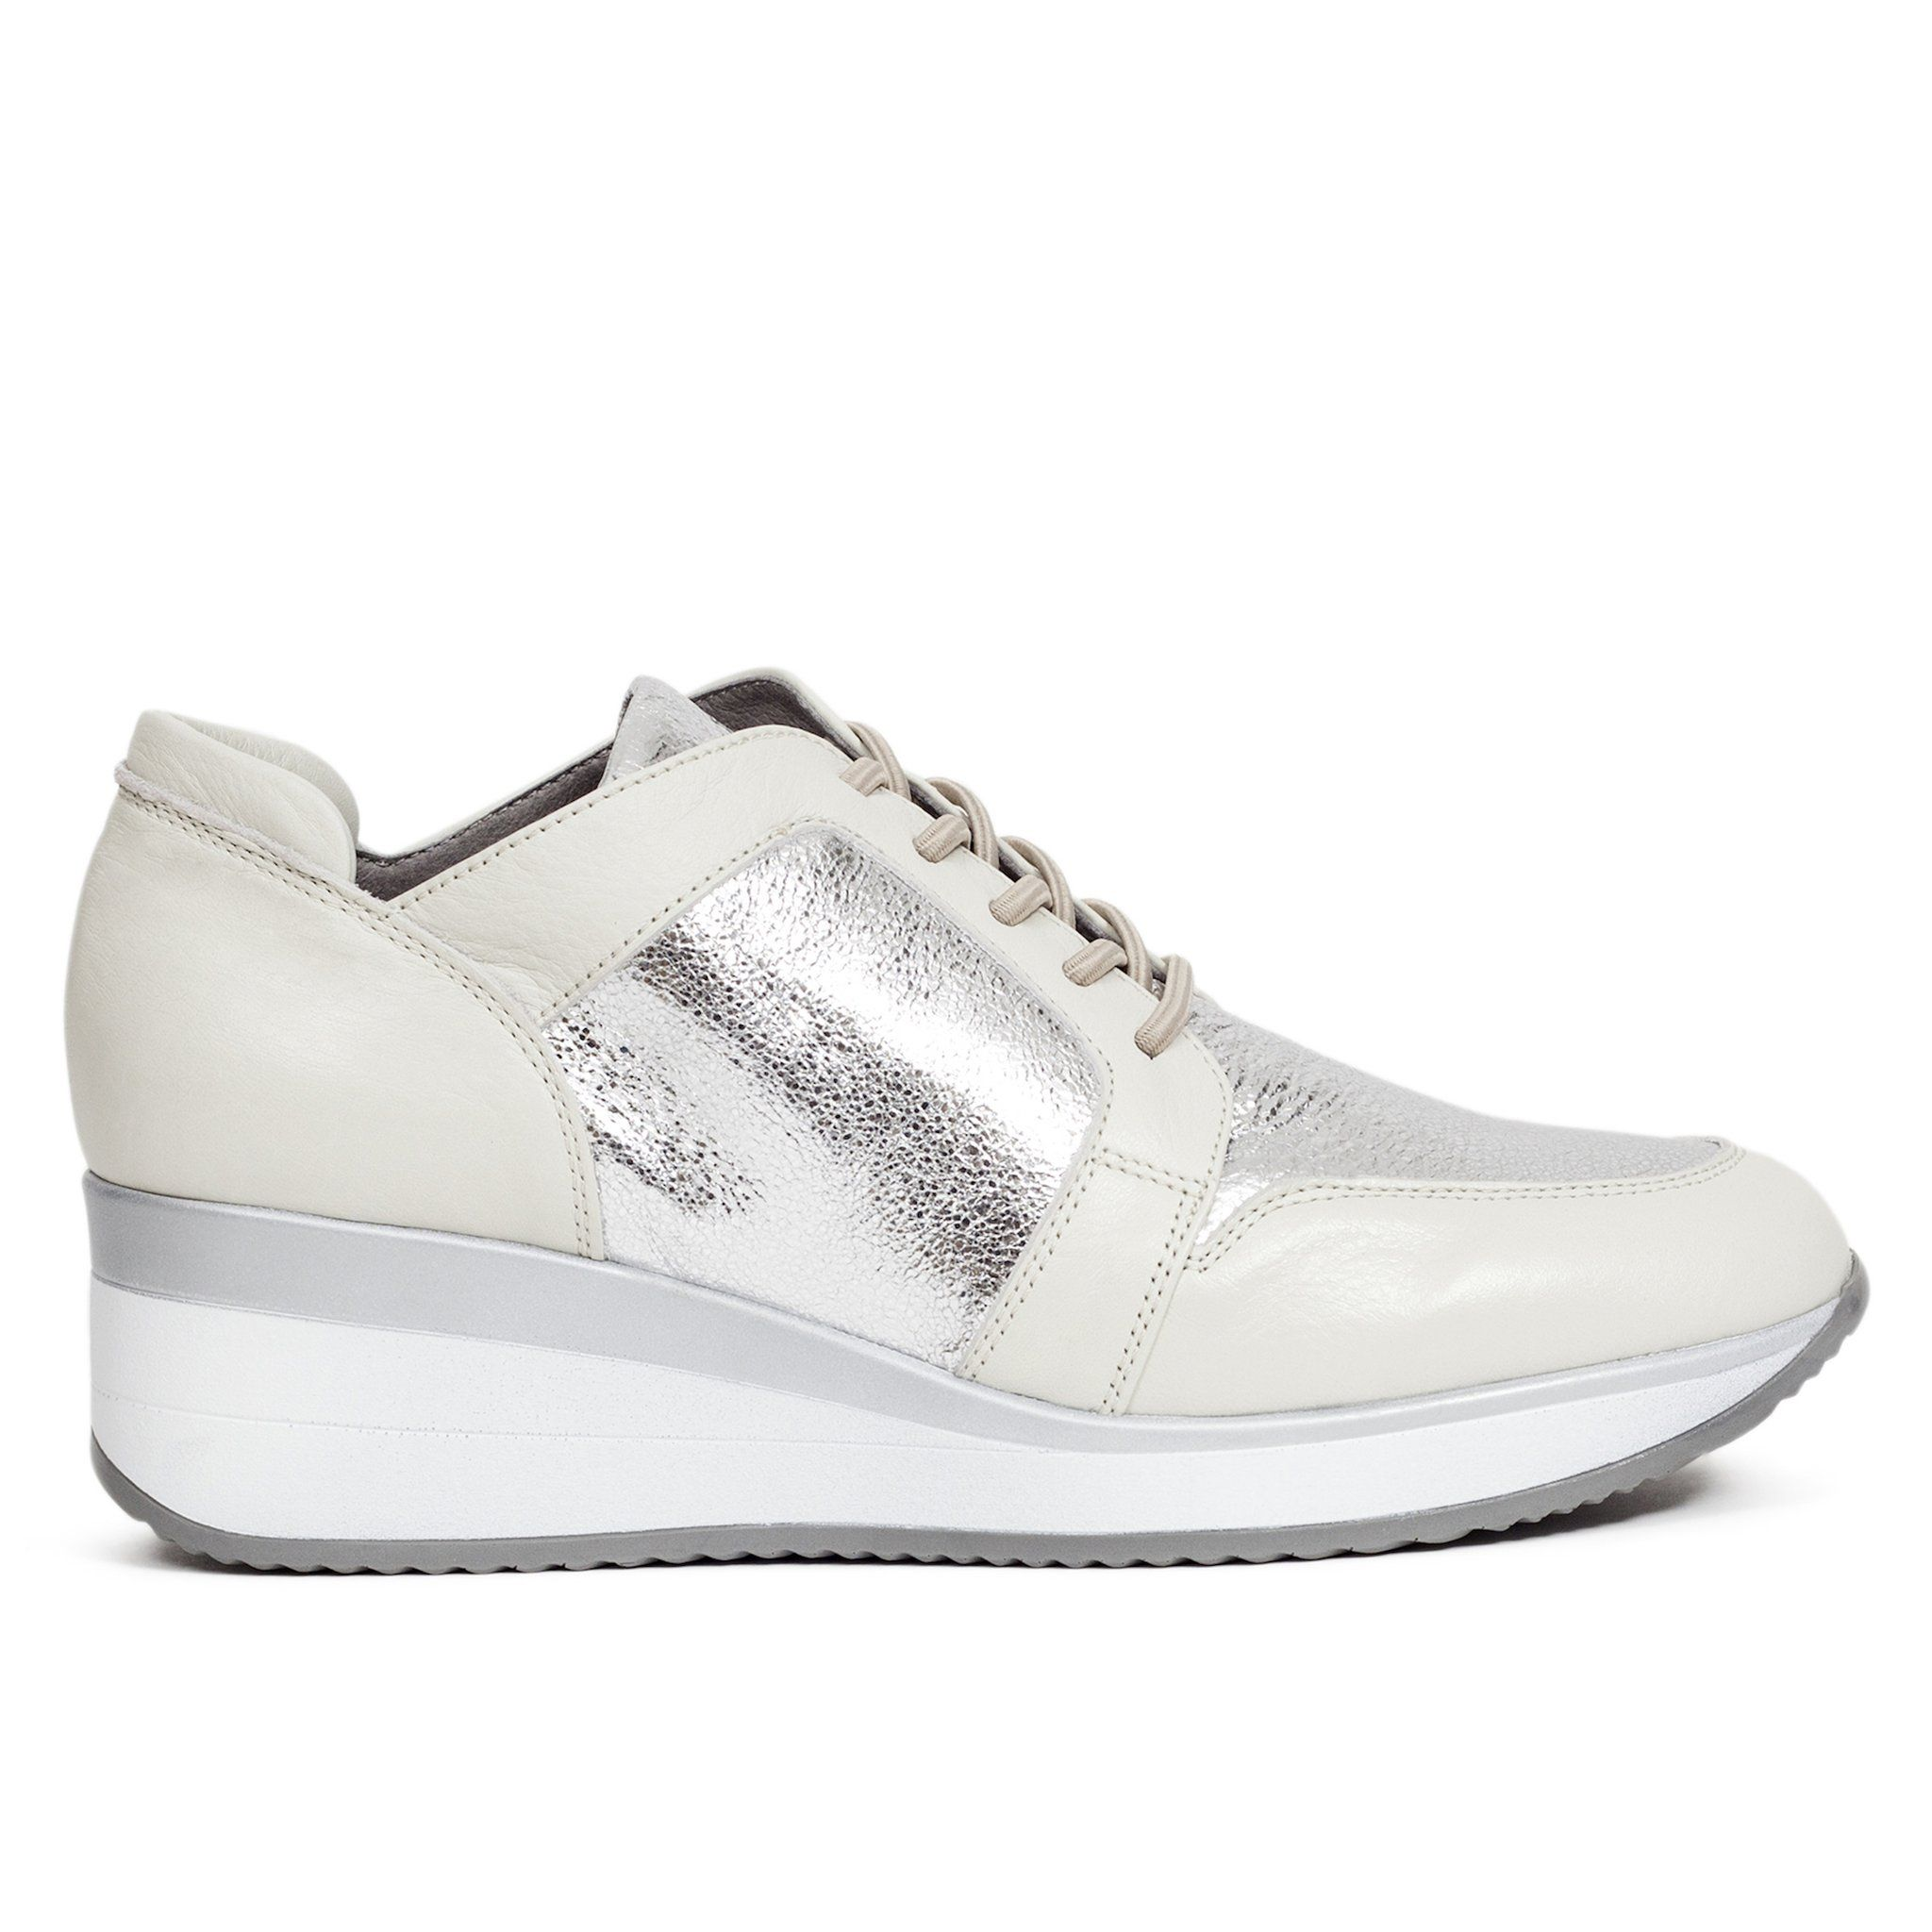 2a09130f Zapato Deportivo cuña mujer Plata MEMORY FOAM - miMaO Zapatos – miMaO  ShopOnline